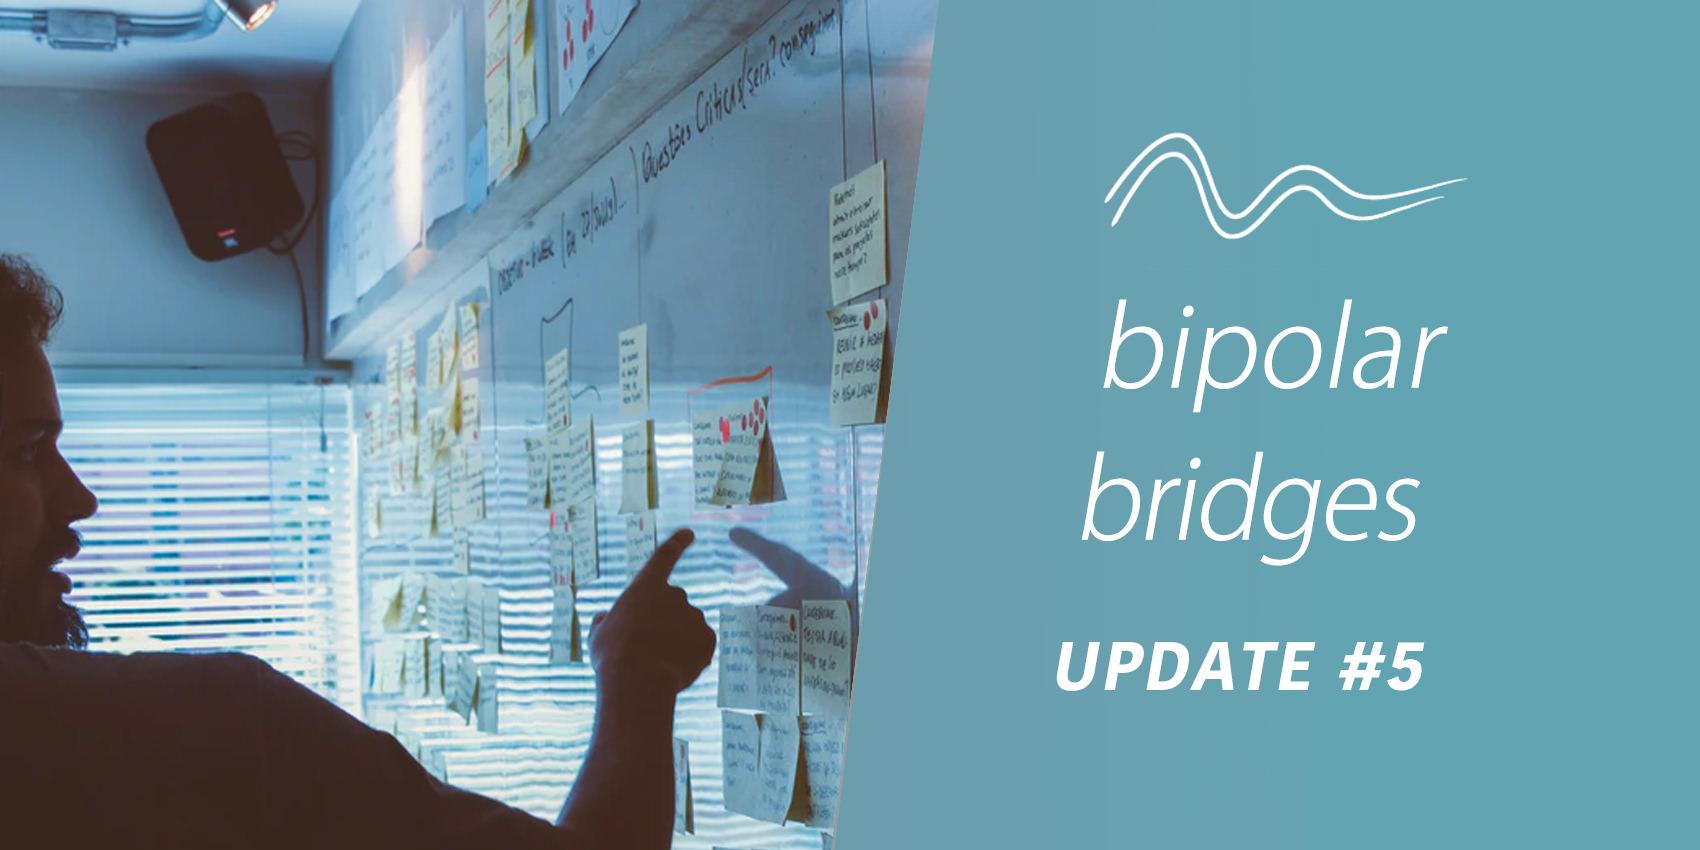 Bipolar Bridges Update 5: Introducing The Bipolar Bridges Advisory Group